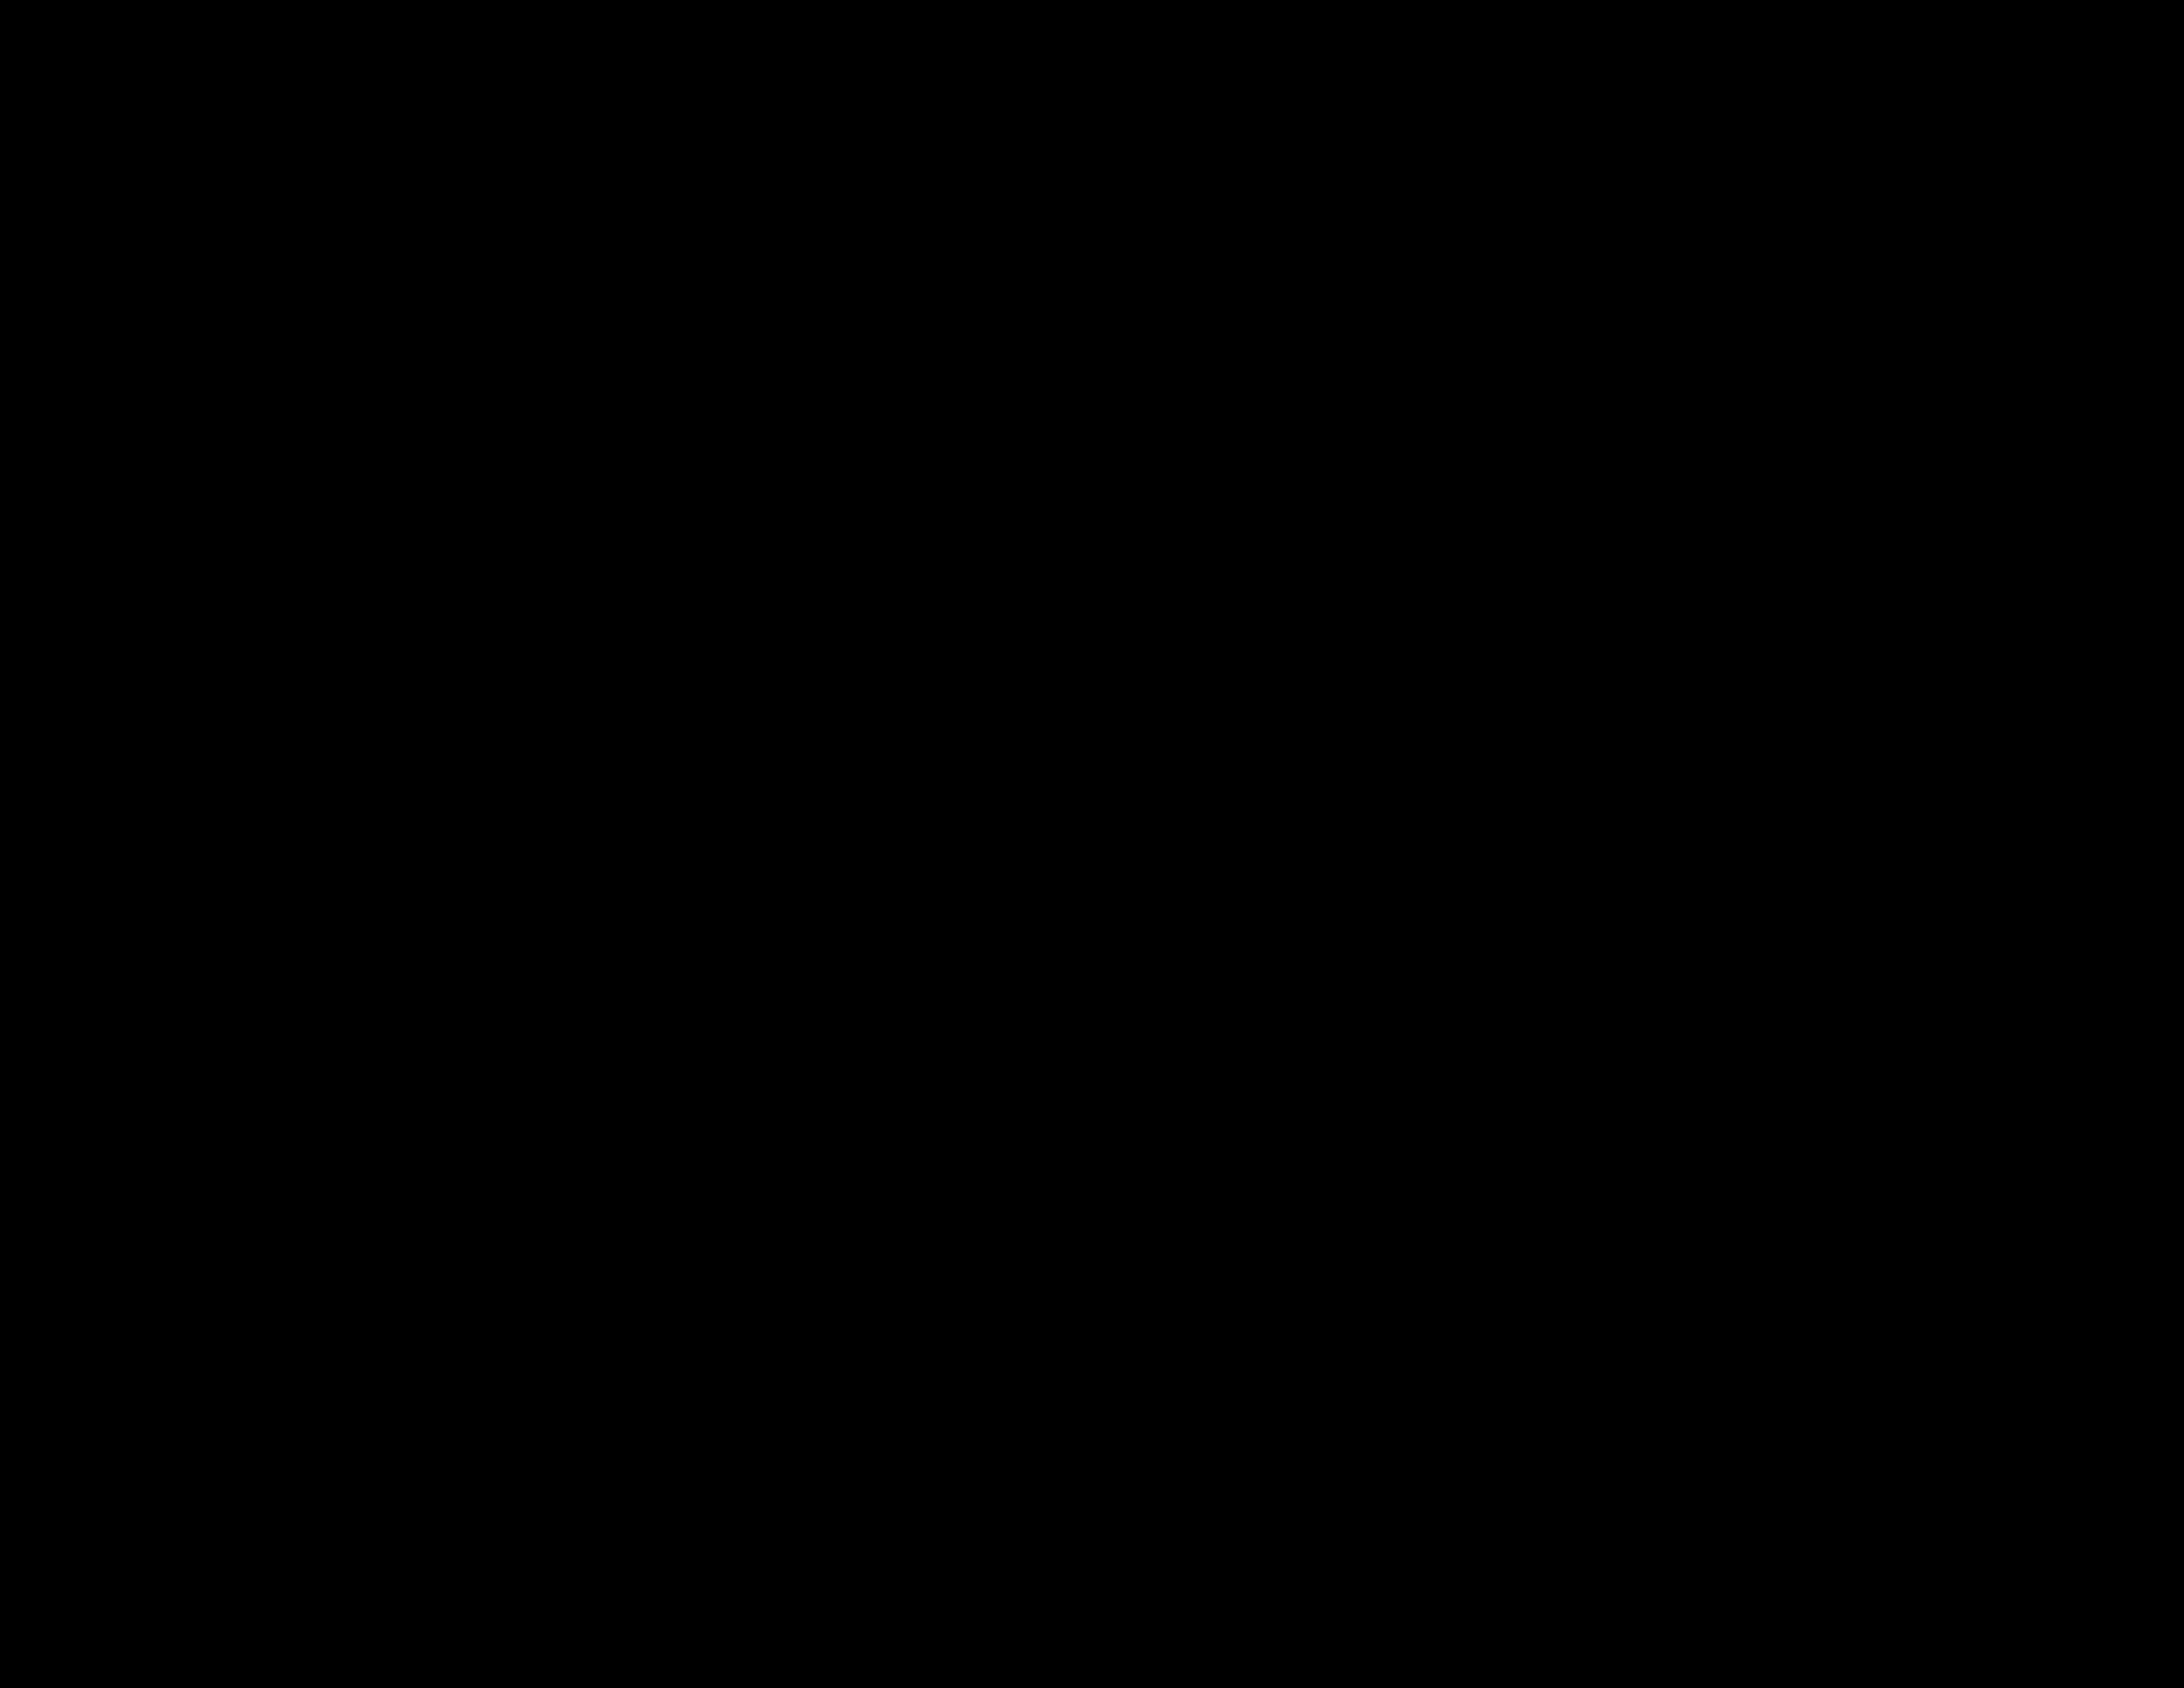 Ruby-logo-01.png